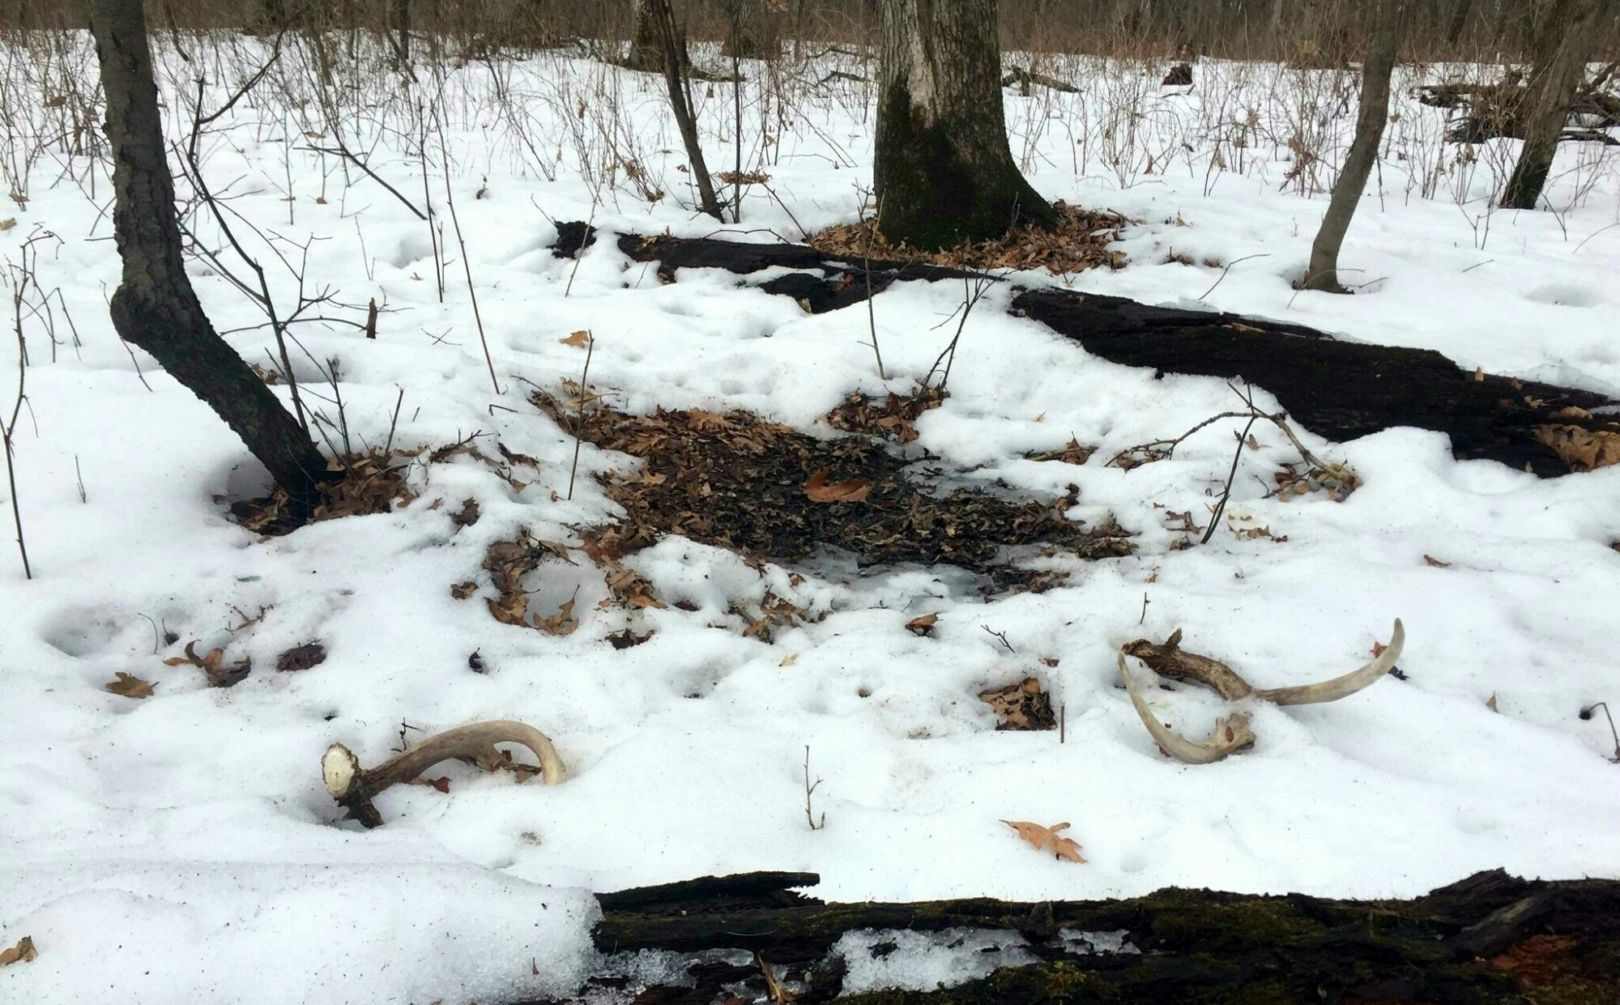 Winter whitetail scouting